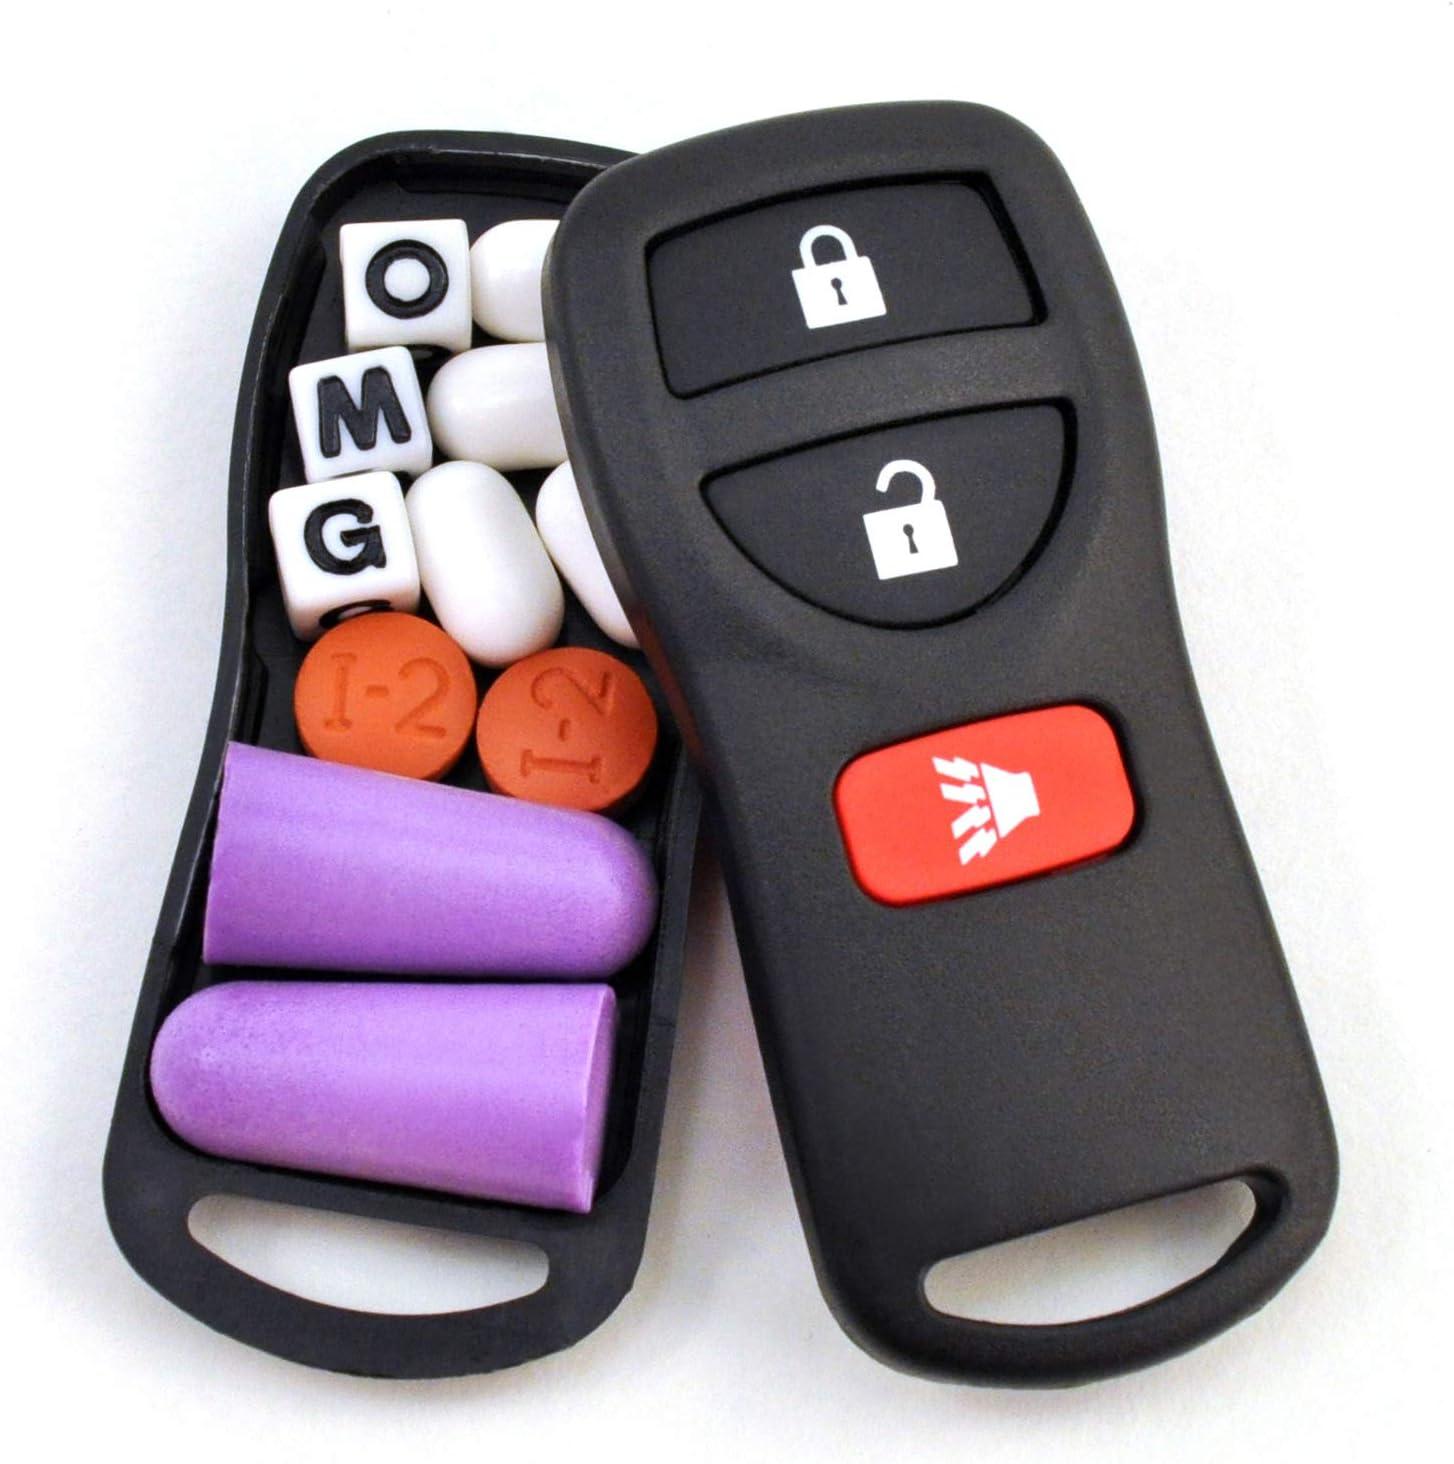 Festivaults The Snea-Key Fob Secret Stash Box Hidden Compartment Diversion Safe Fake Car Key